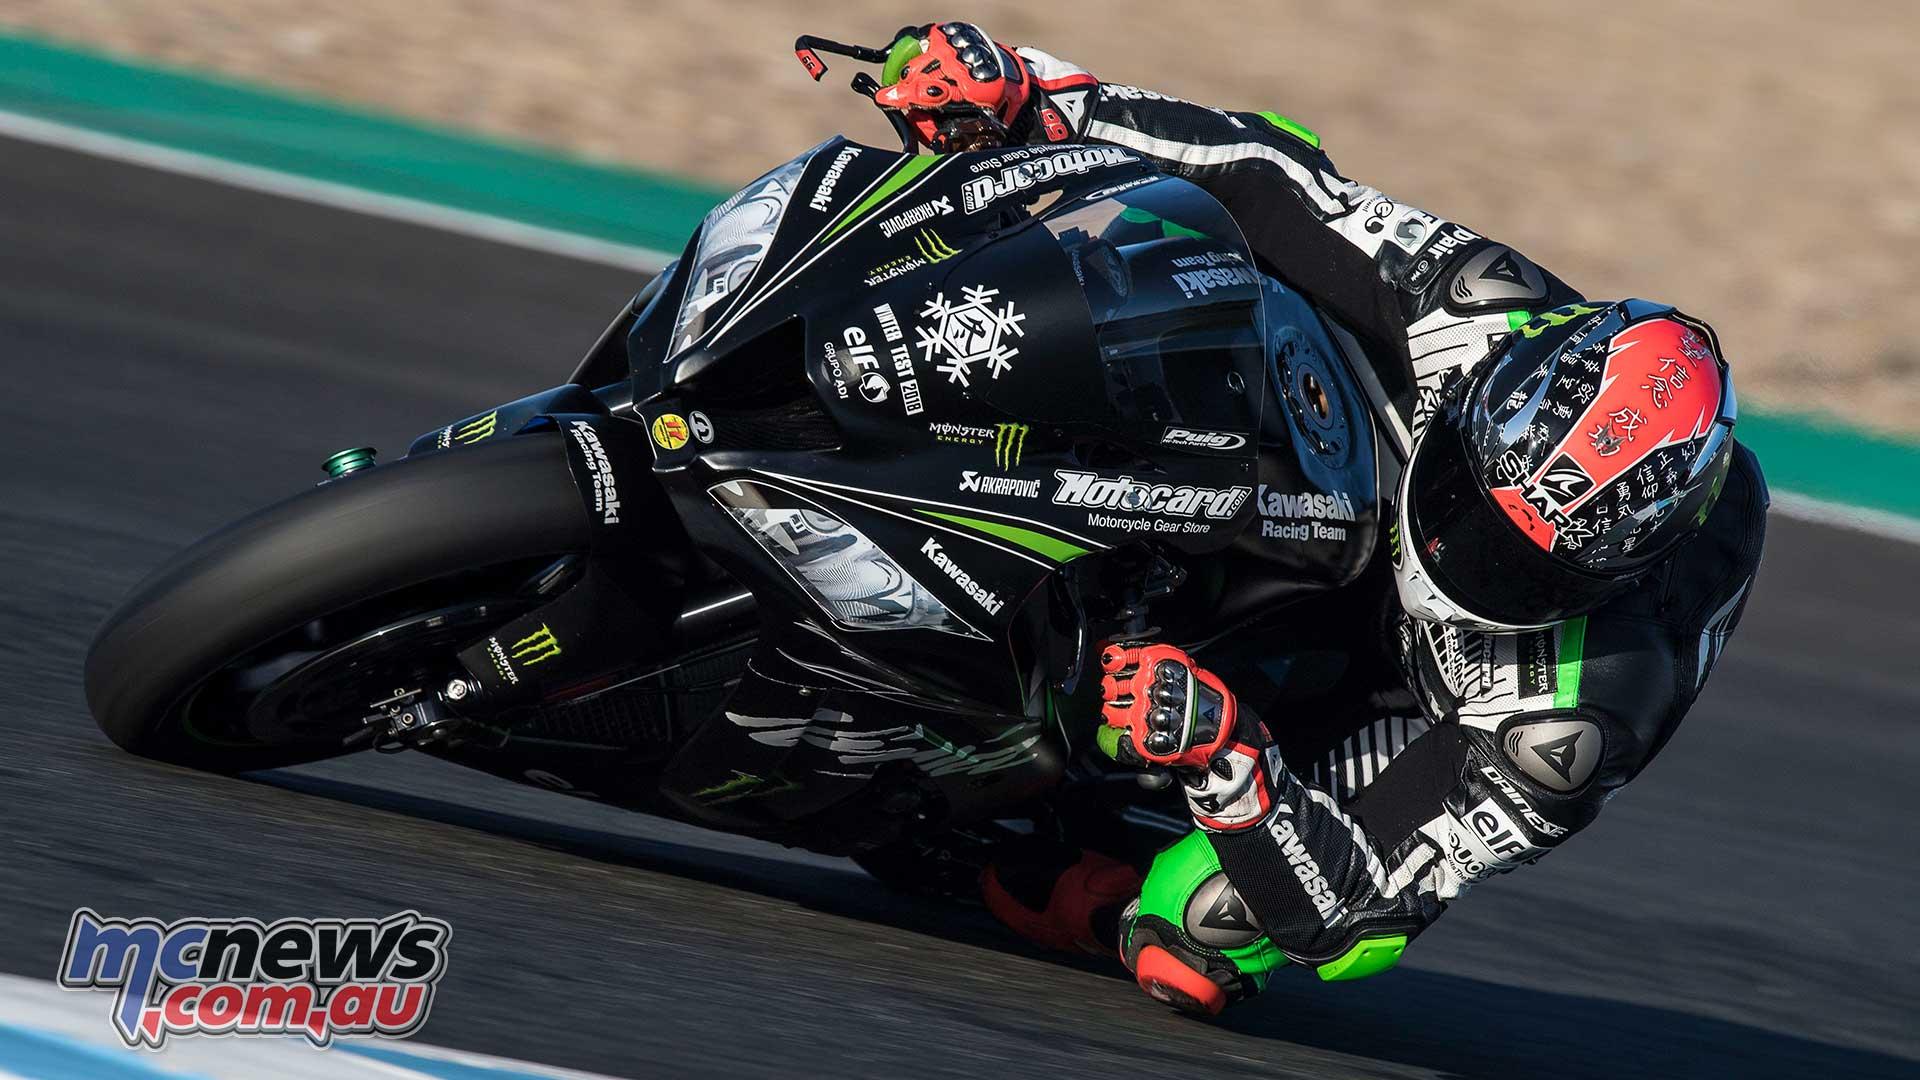 Tom Sykes tops Jerez WorldSBK Test | Davies injured | MCNews.com.au